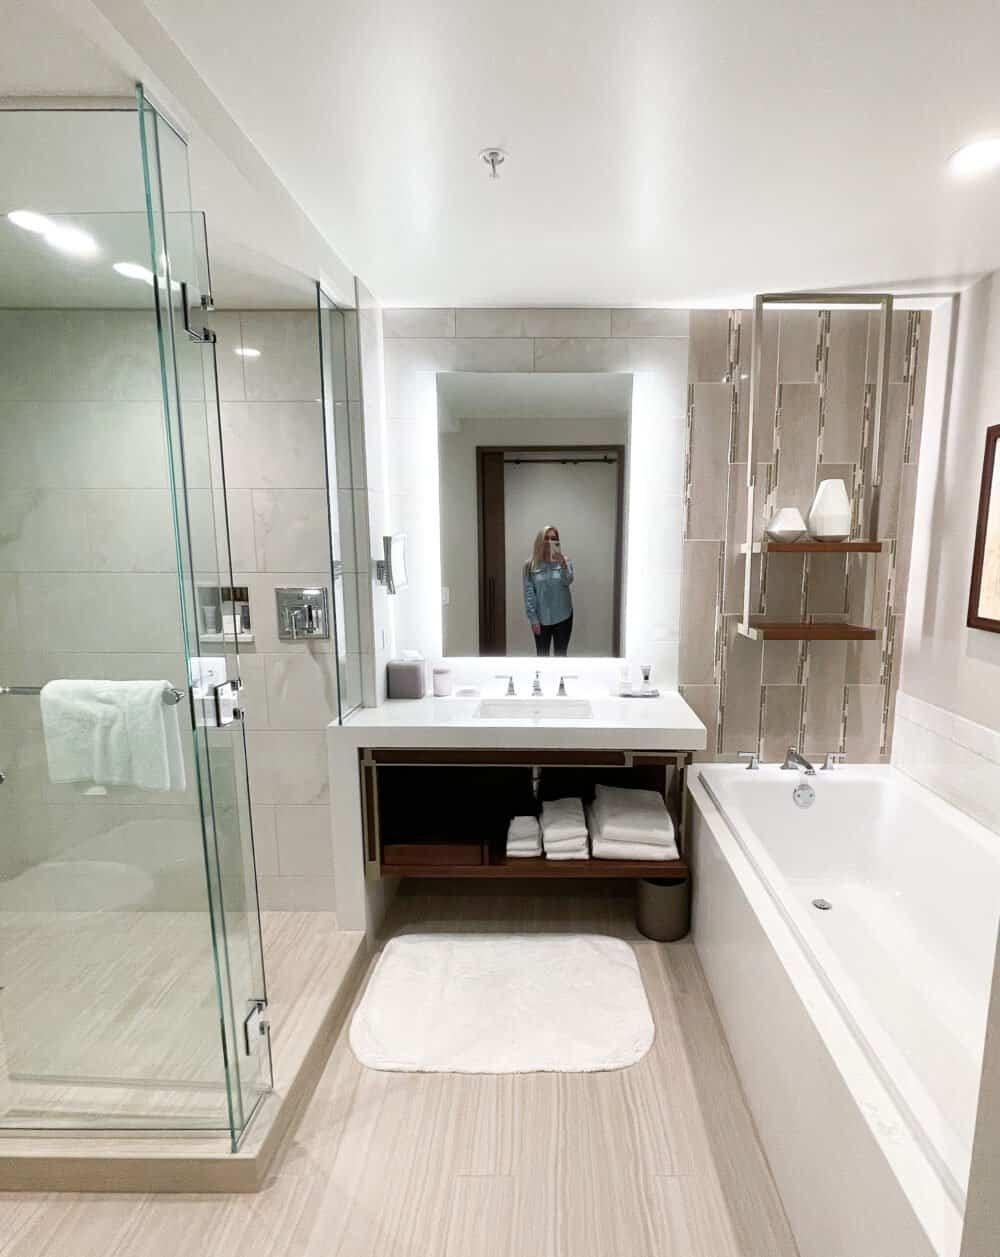 JW Marriot bathroom